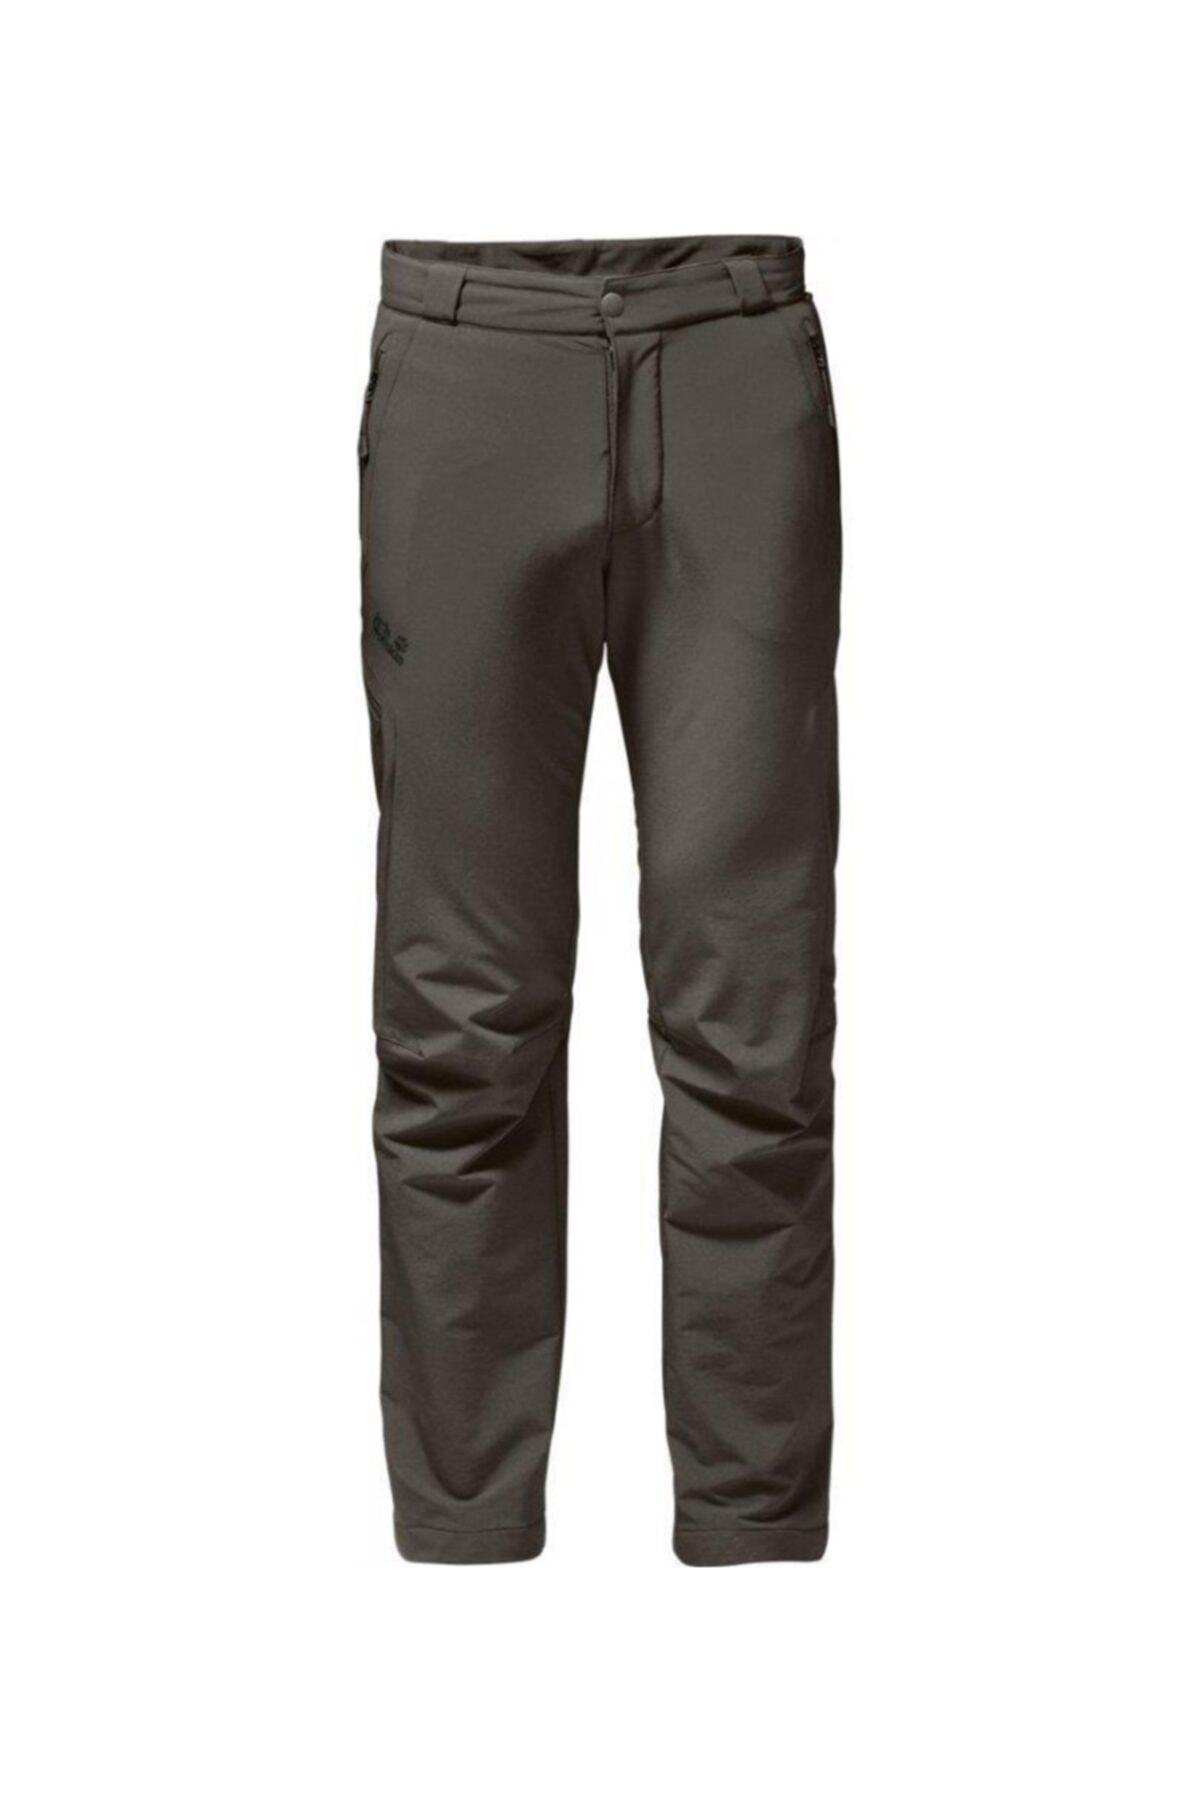 Jack Wolfskin Activate Thermic Pants Erkek Pantolon - 1503601-7010 1